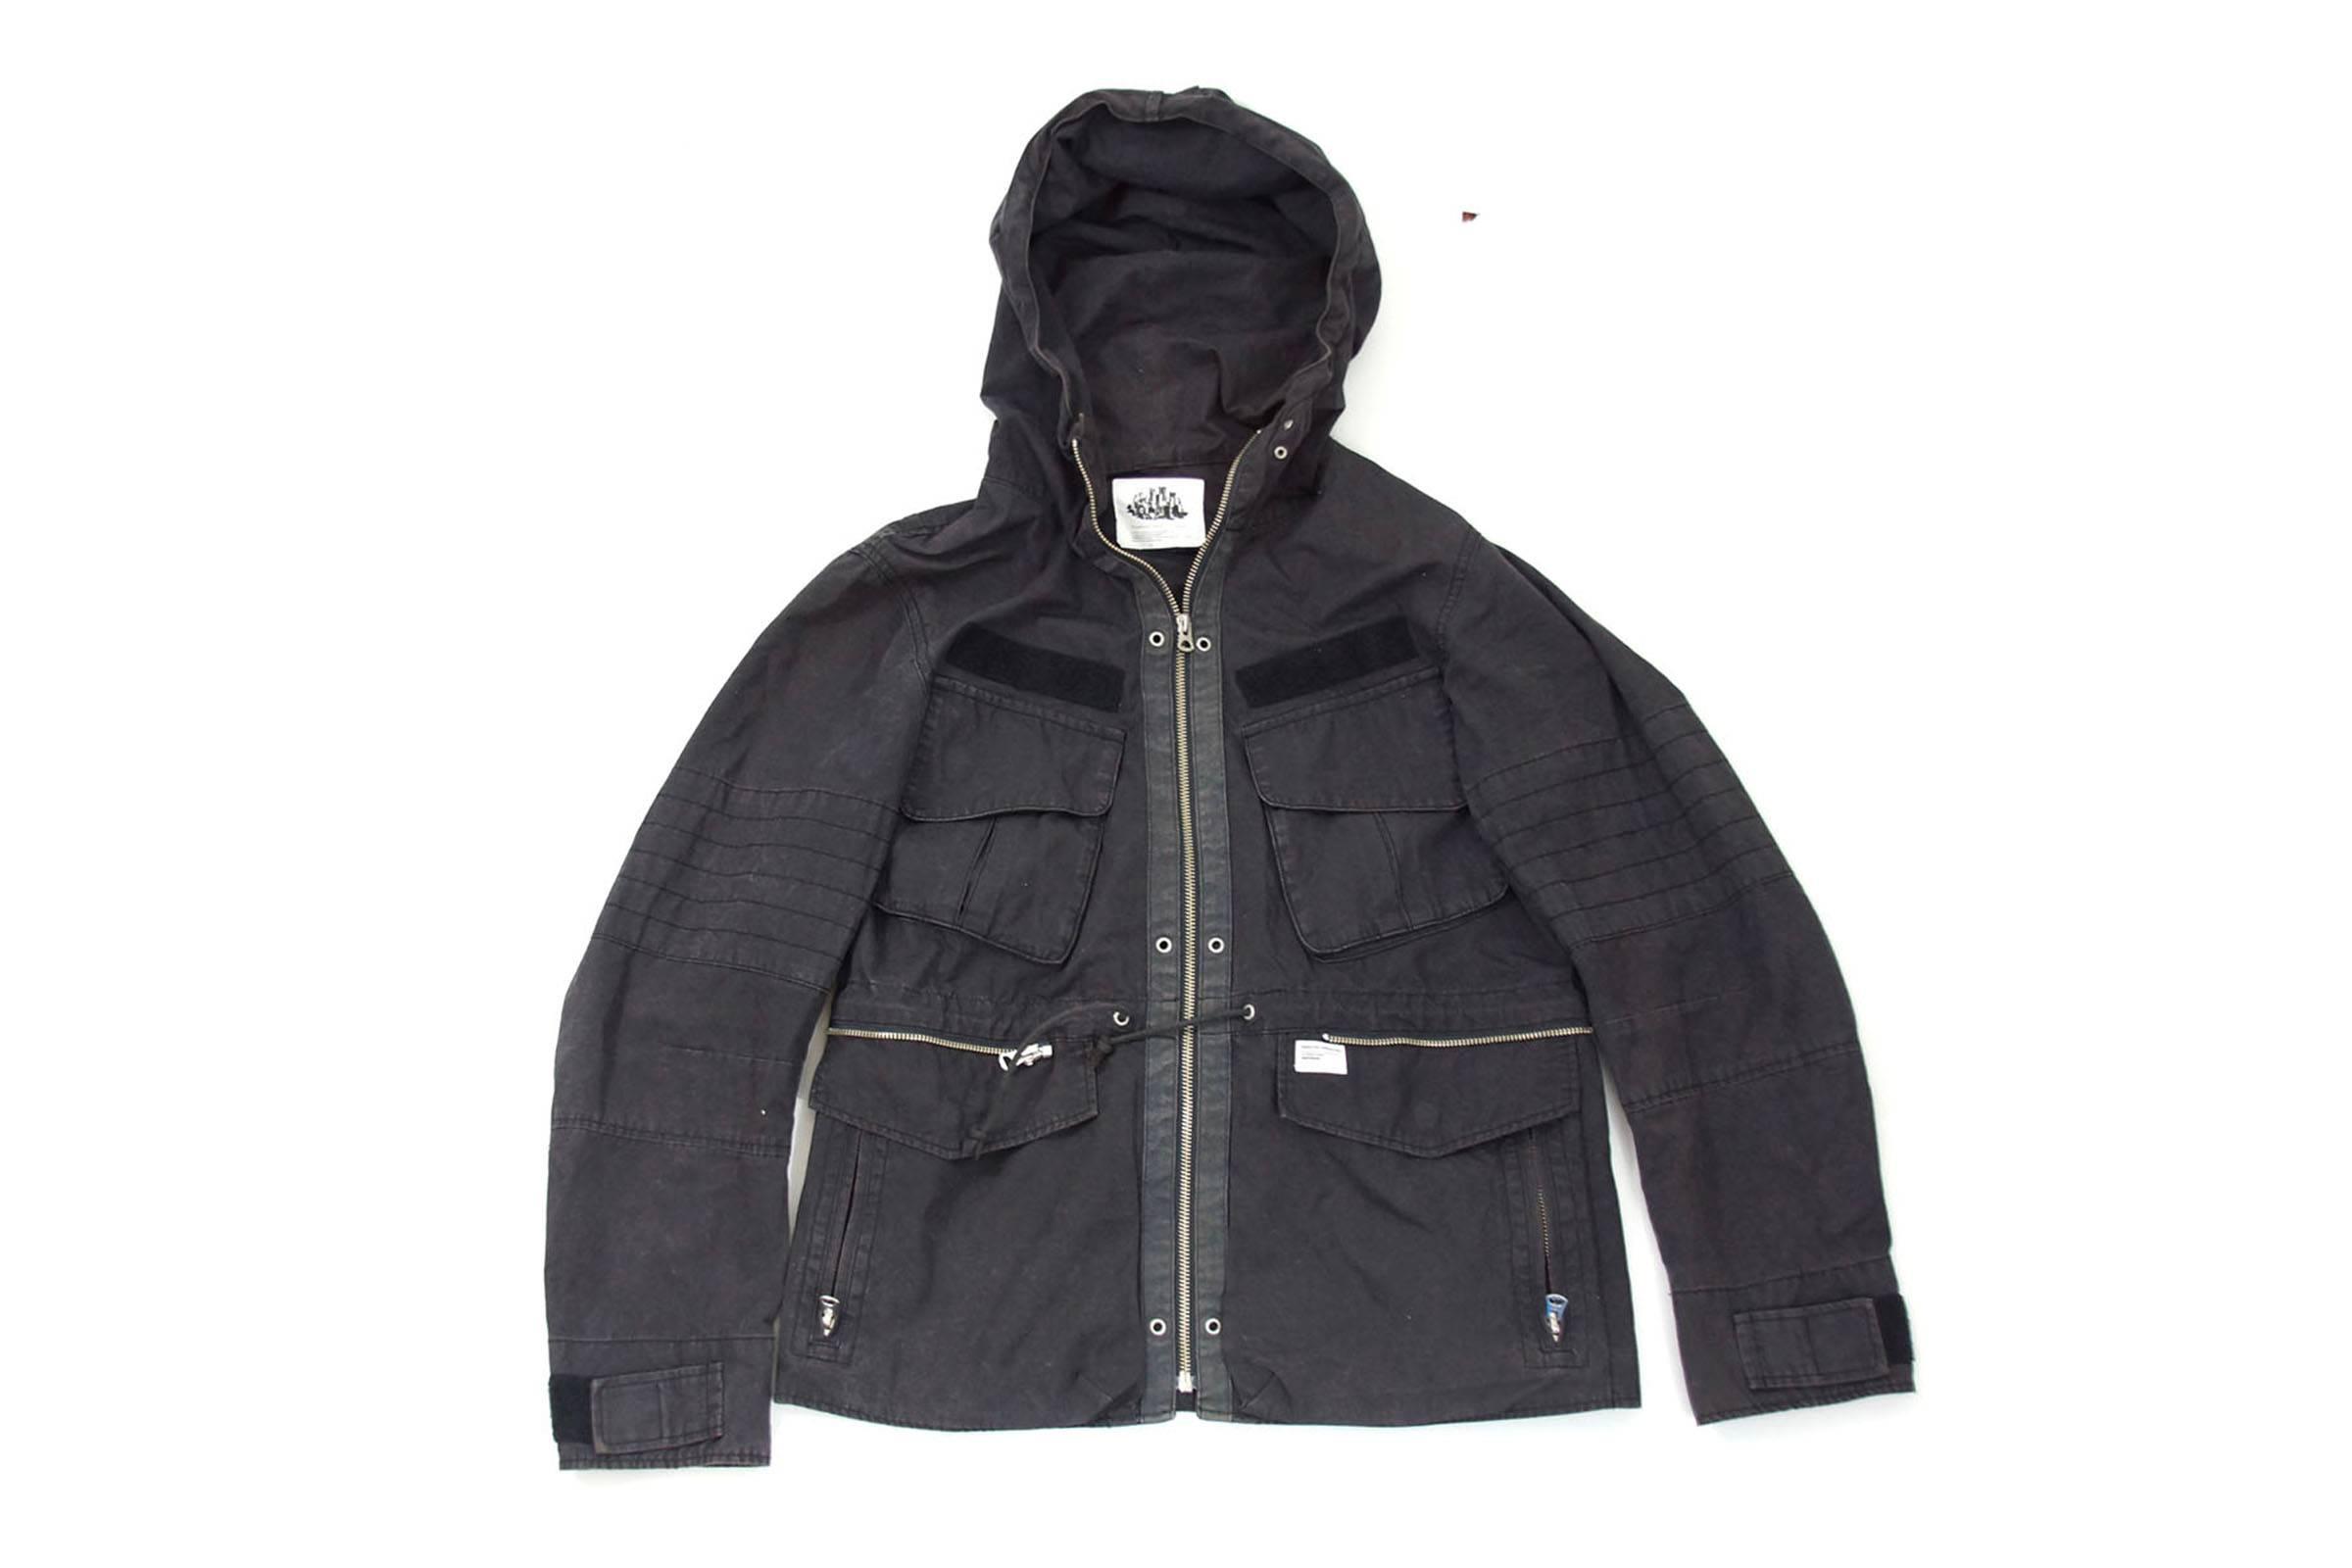 Undecover Underman Spring/Summer 2011 M-65 Jacket